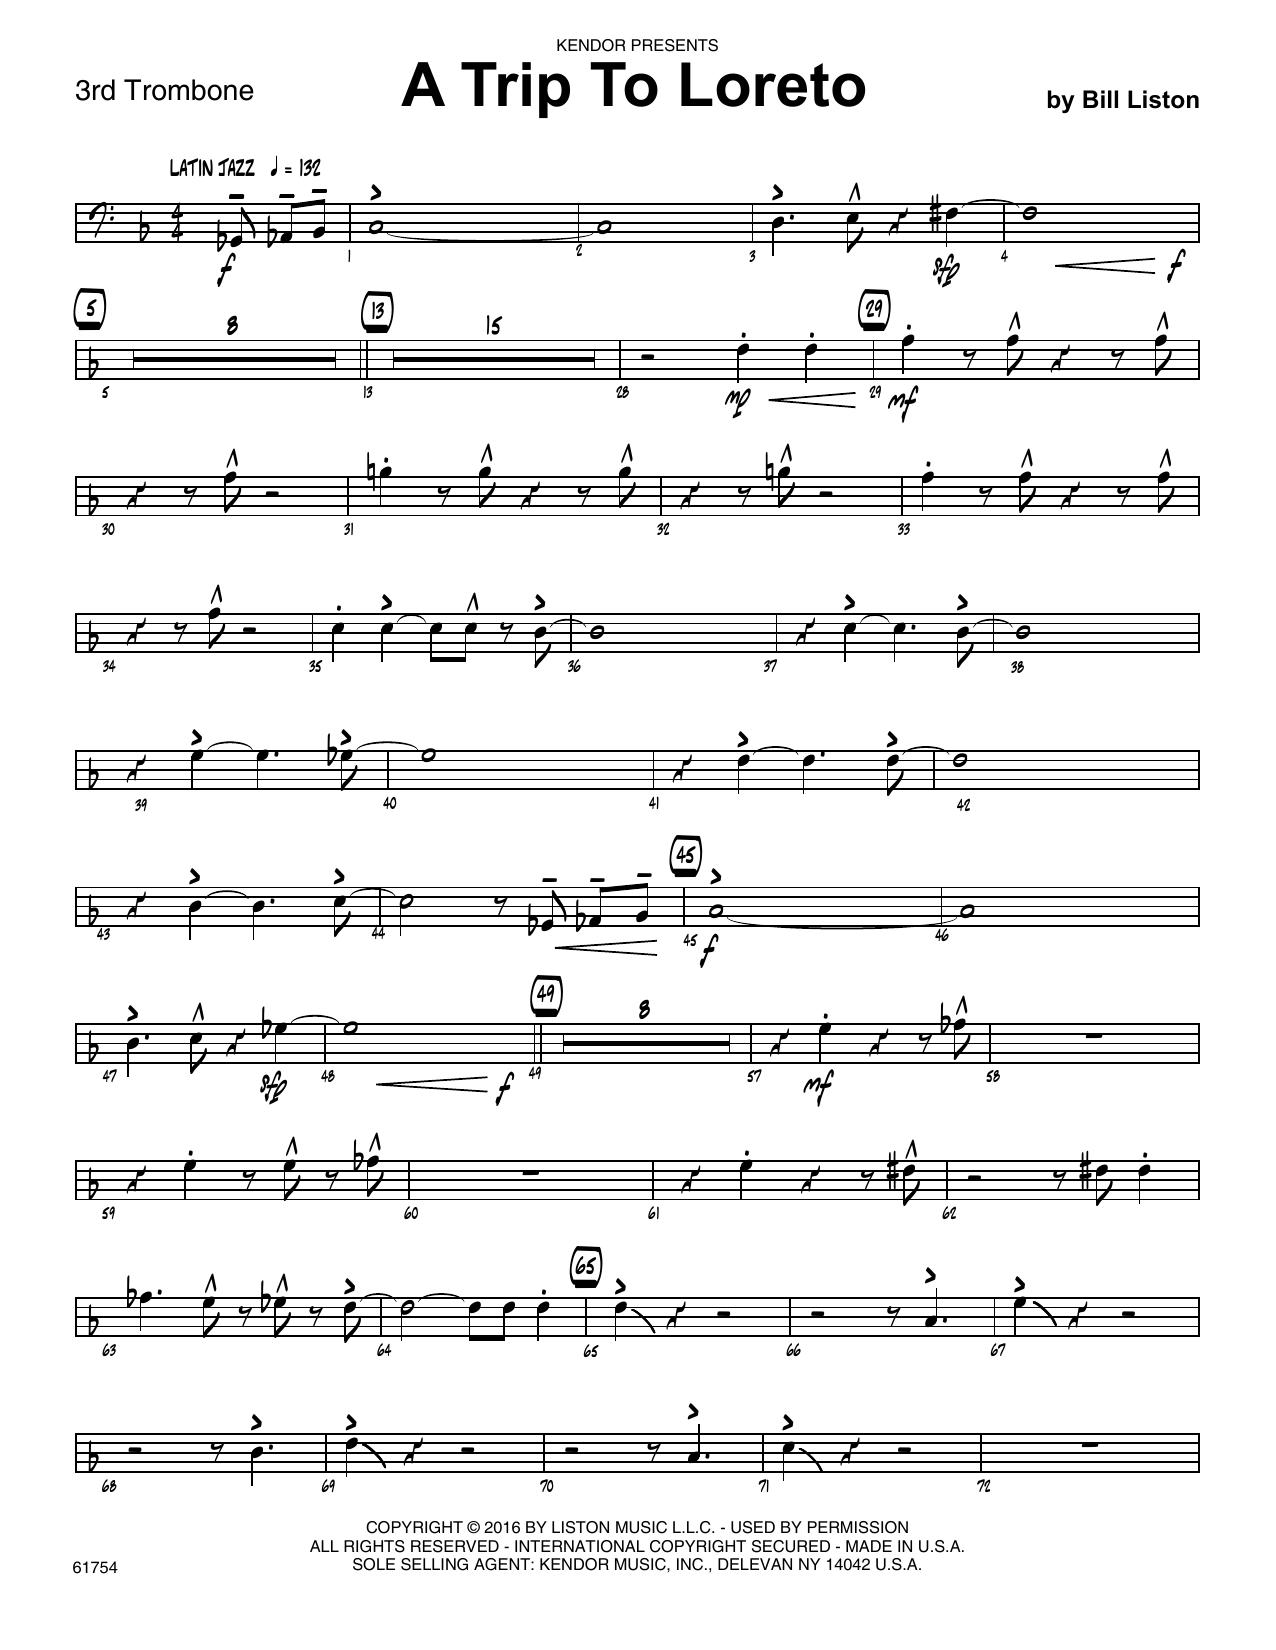 A Trip To Loreto - 3rd Trombone Sheet Music